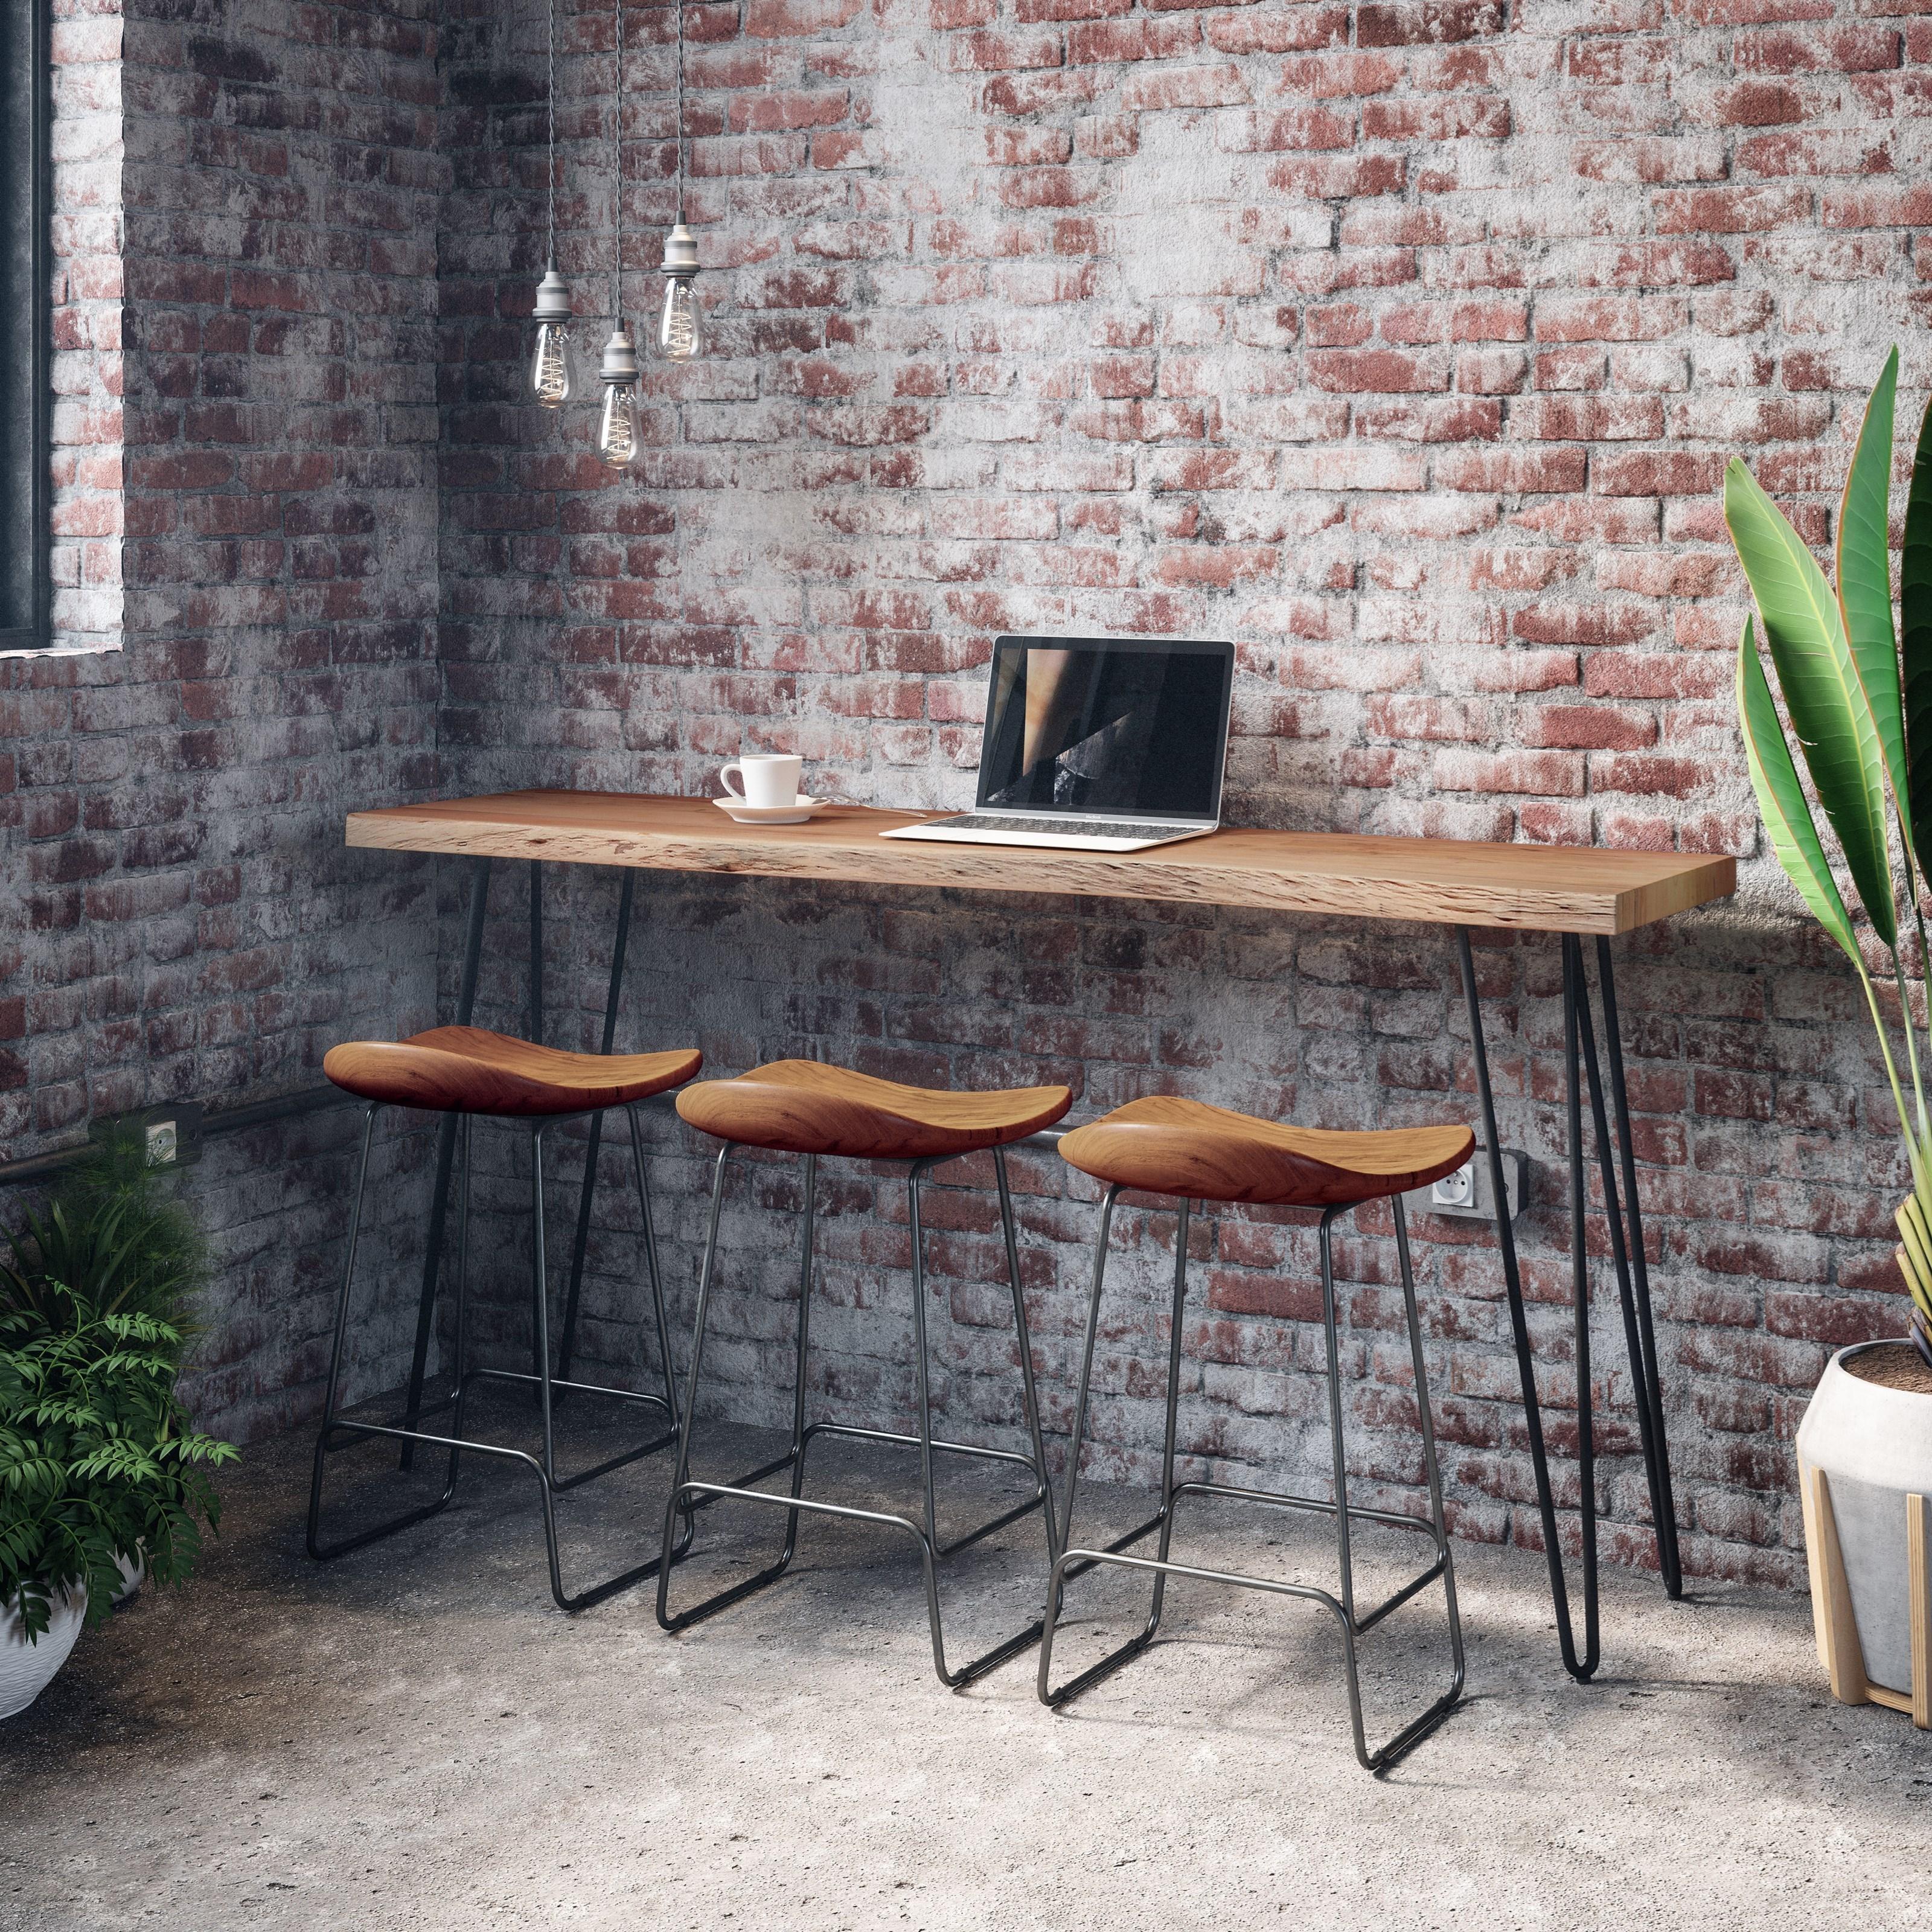 Nature's Edge 4-Piece Sofa Counter Table and Stool Set by Jofran at Jofran